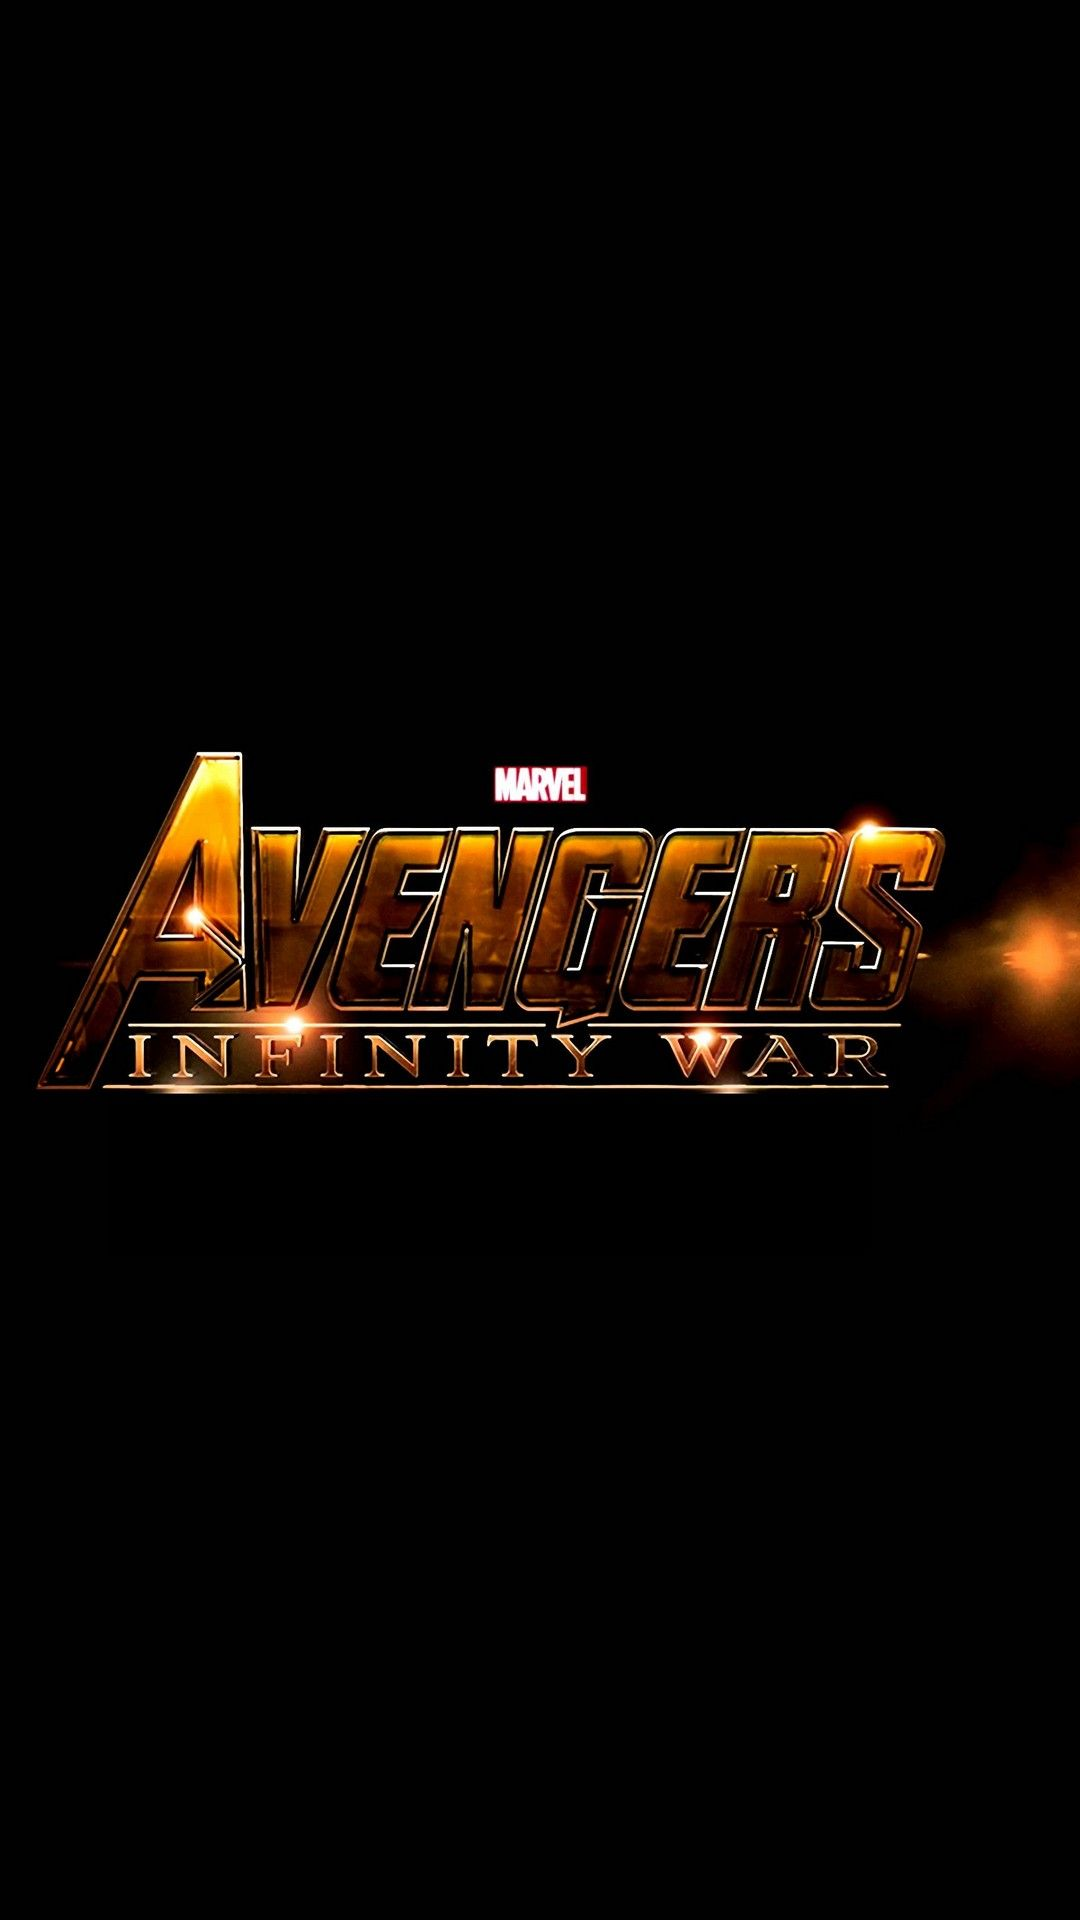 Wallpapers Avengers Infinity War 2019 Avengers Printables